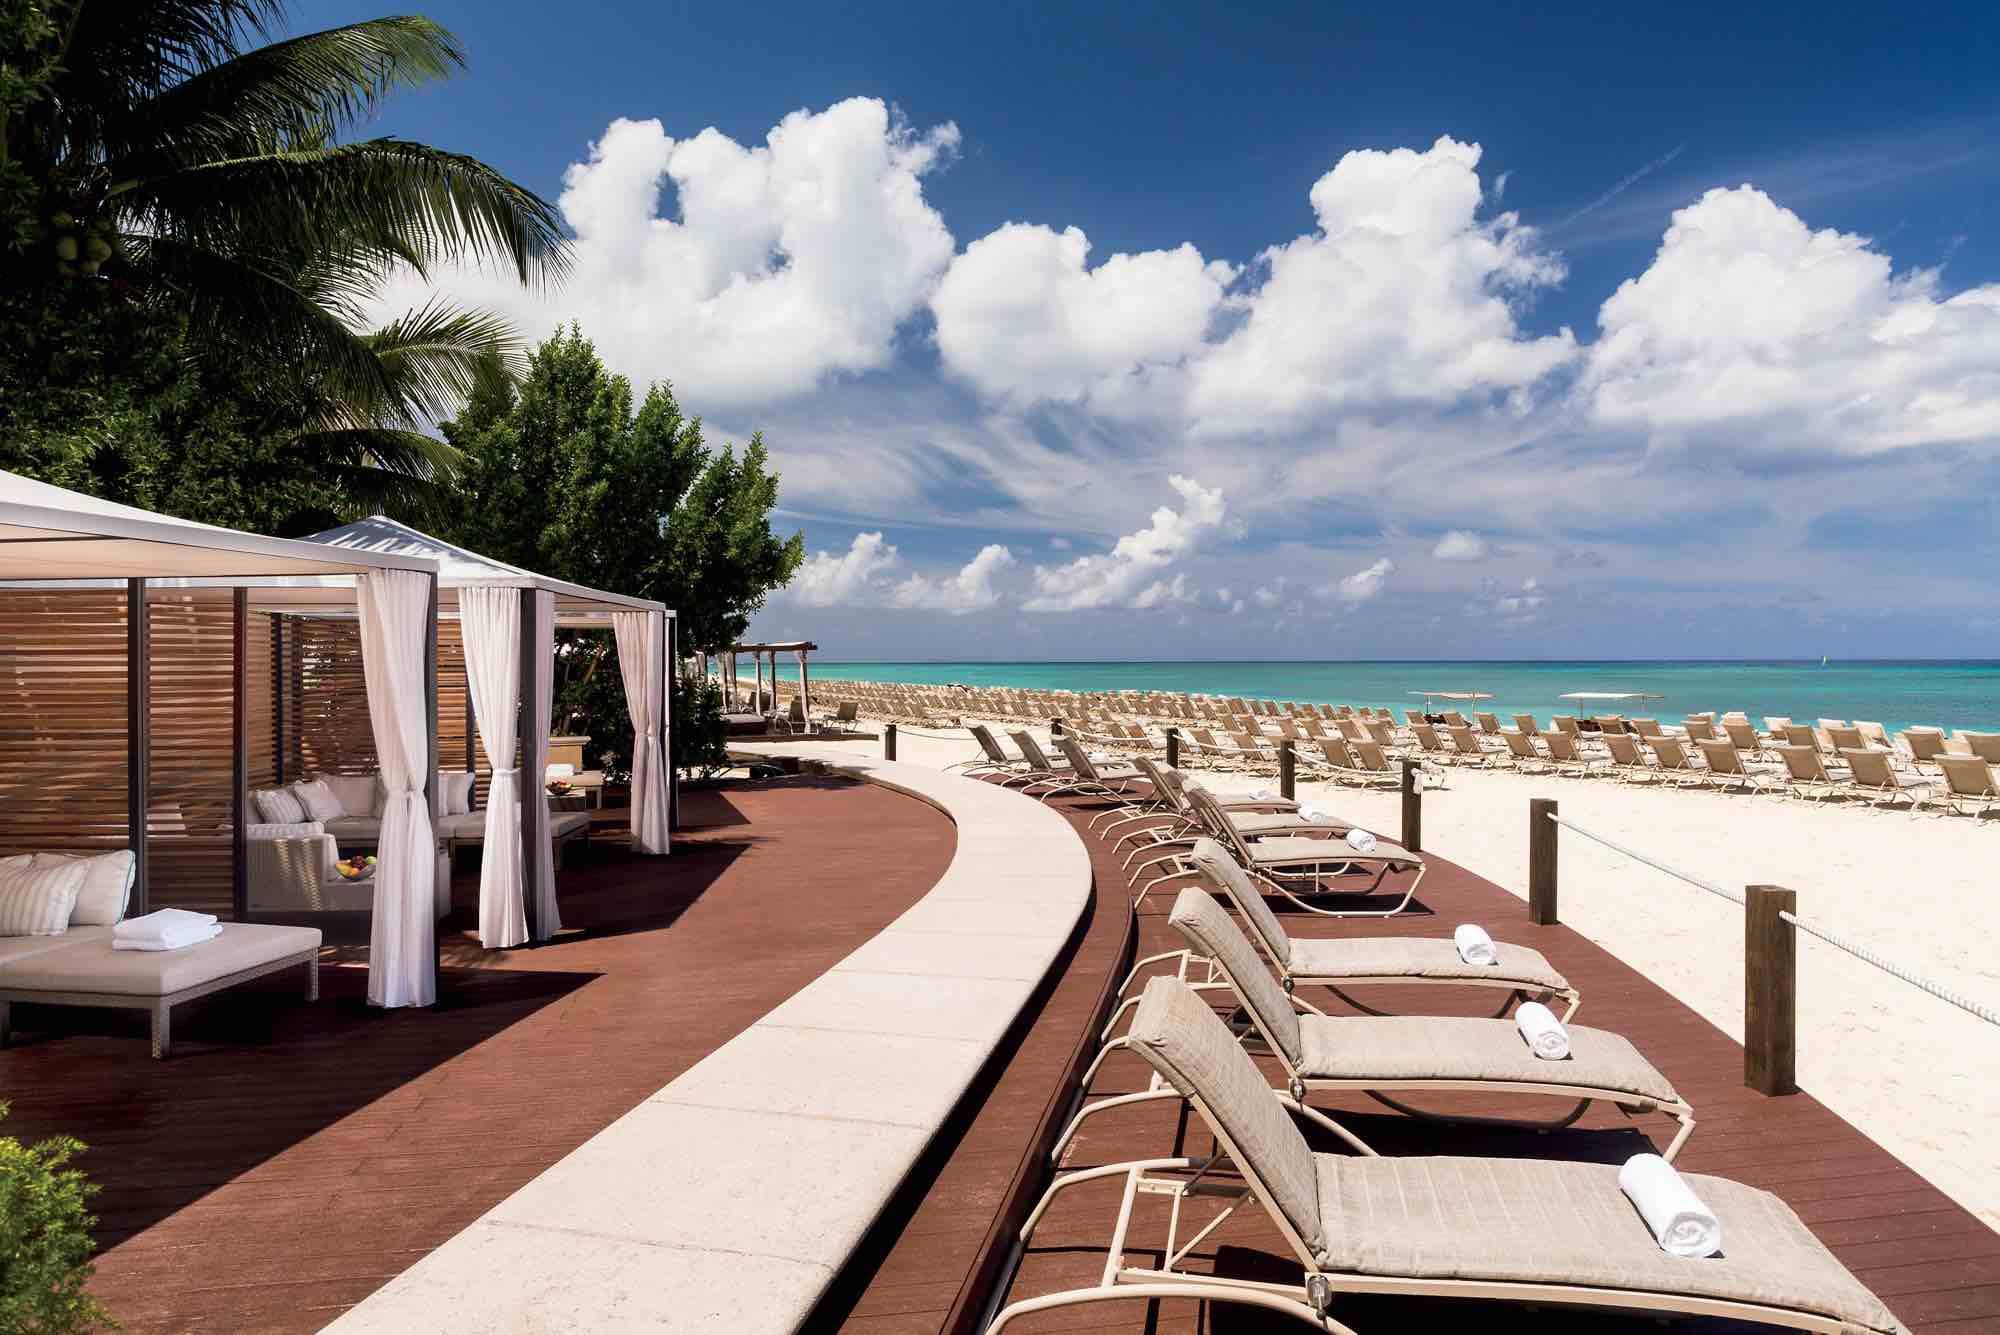 Luxury Hotels in Cayman Islands Ritz Carlton beach and cabanas